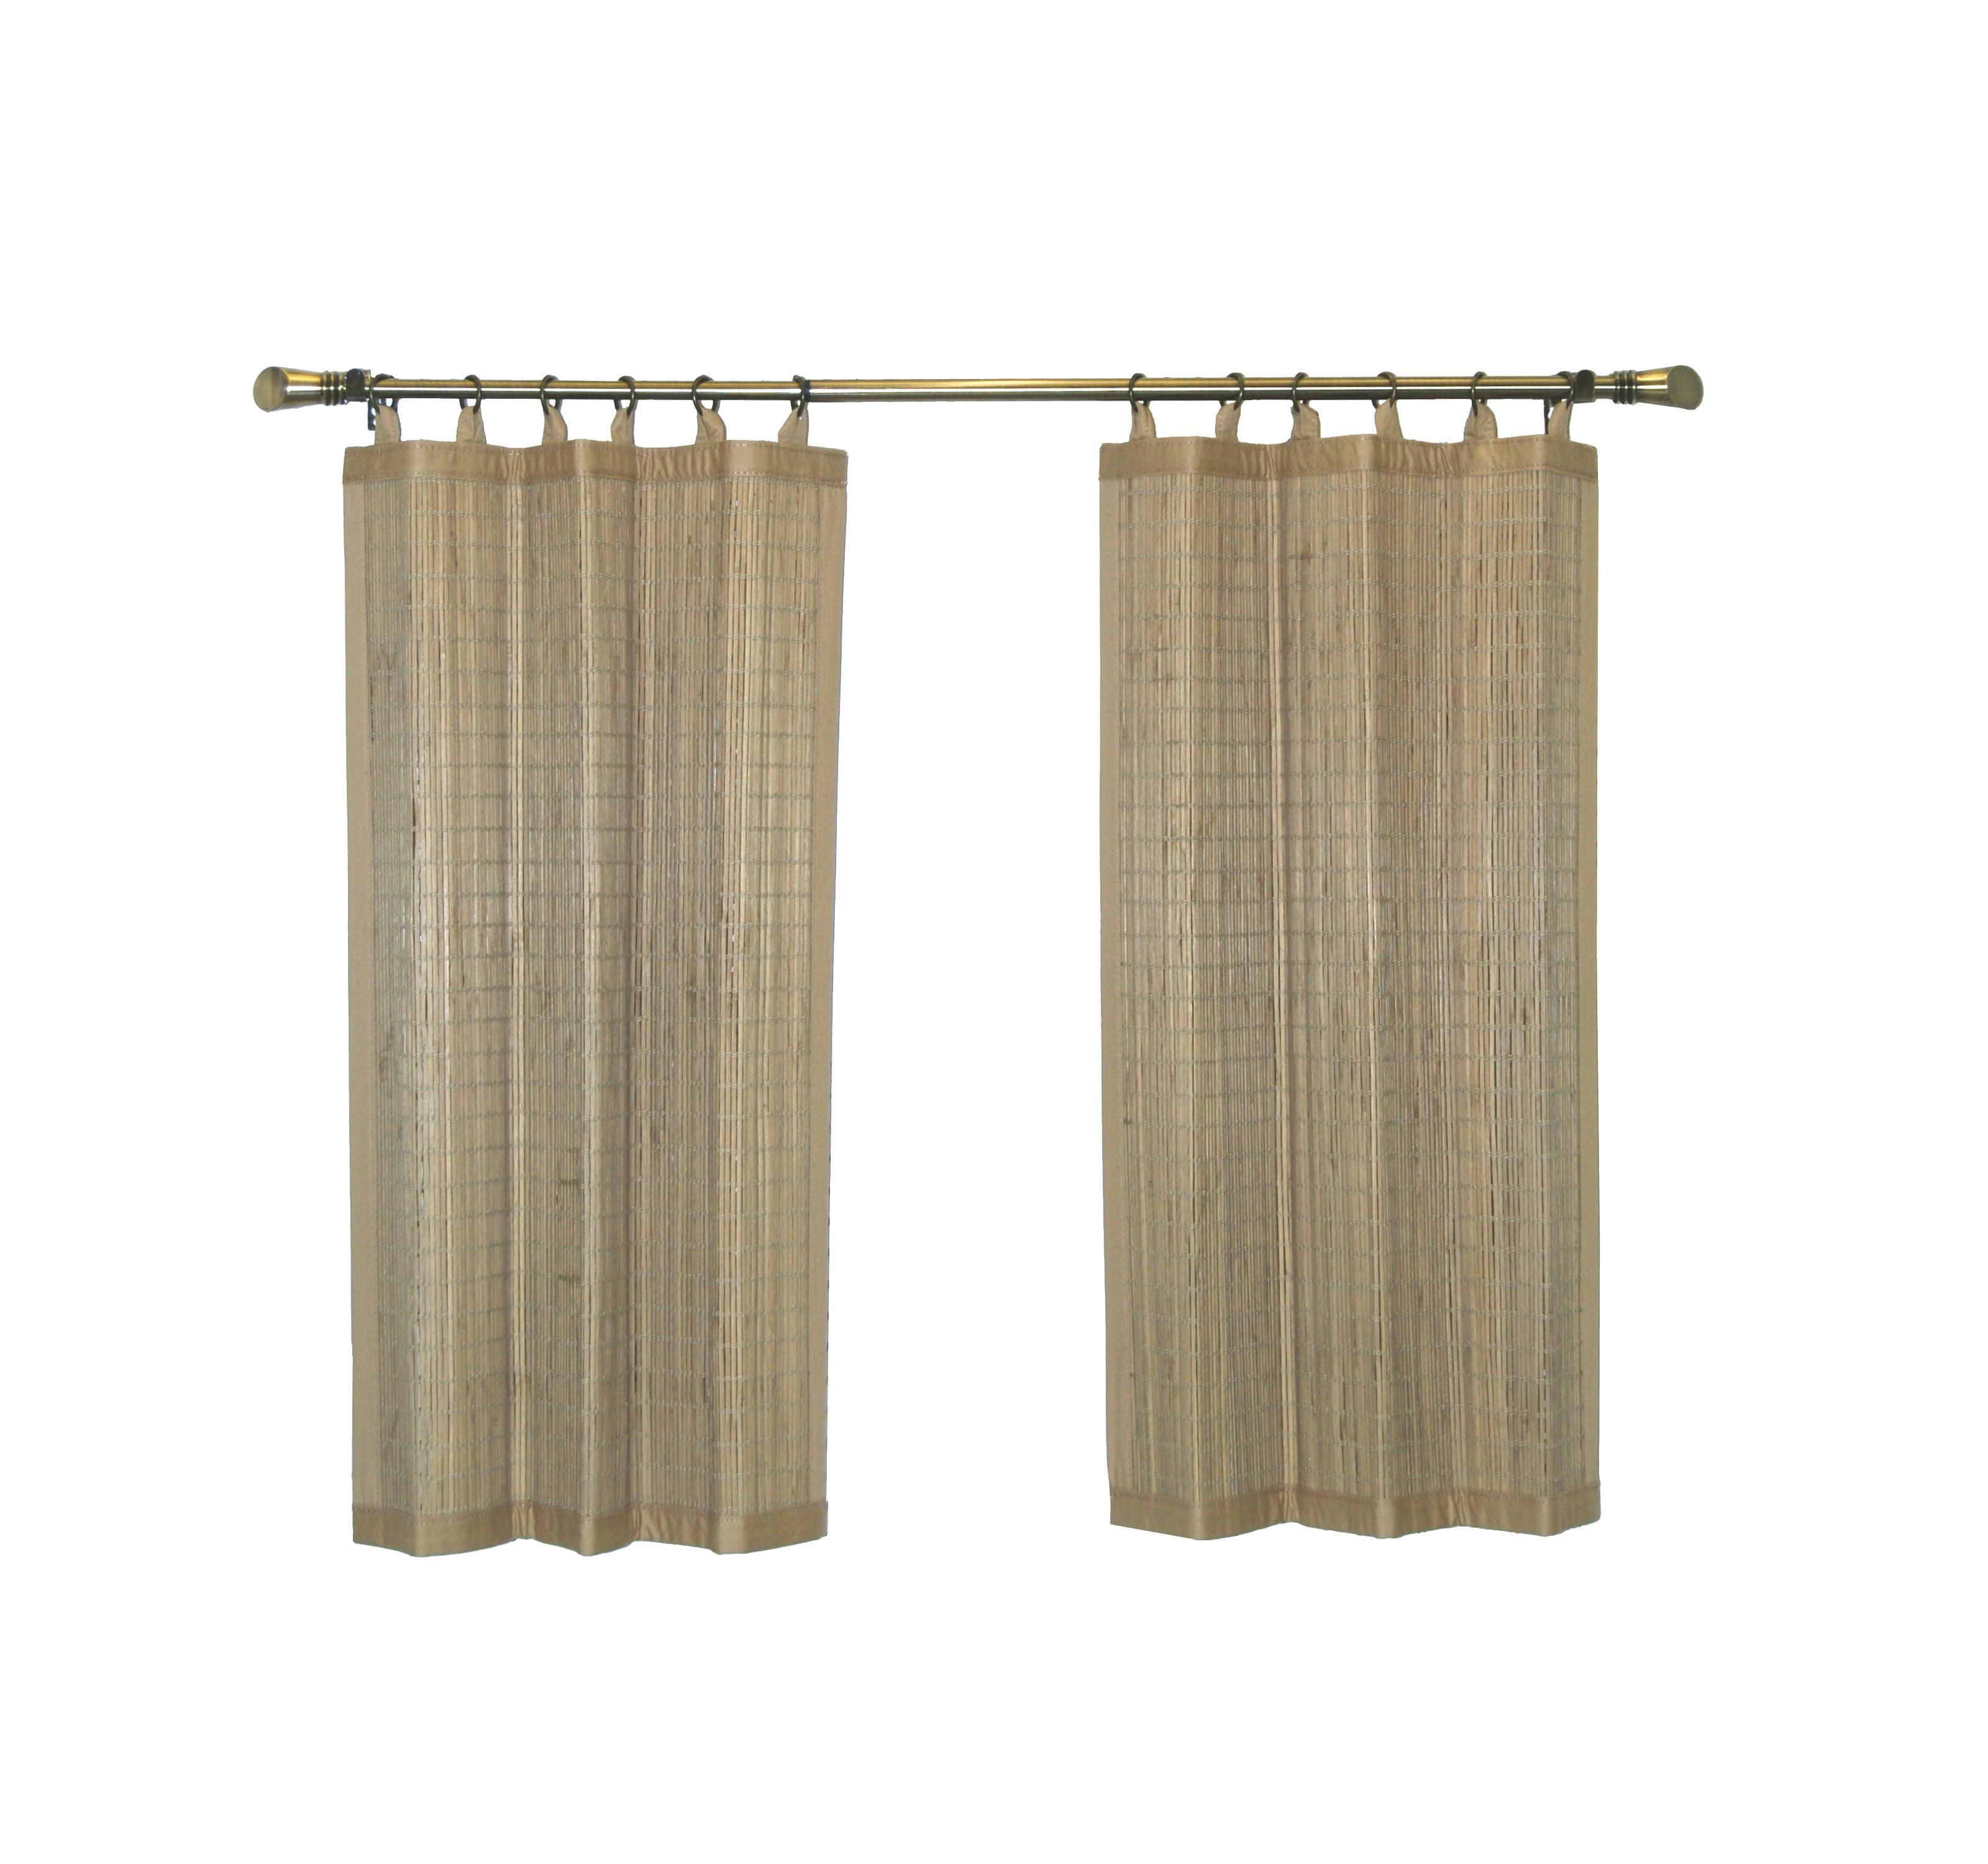 Versailles Bamboo Wood Ring Top Tier Set (24in x 36in)